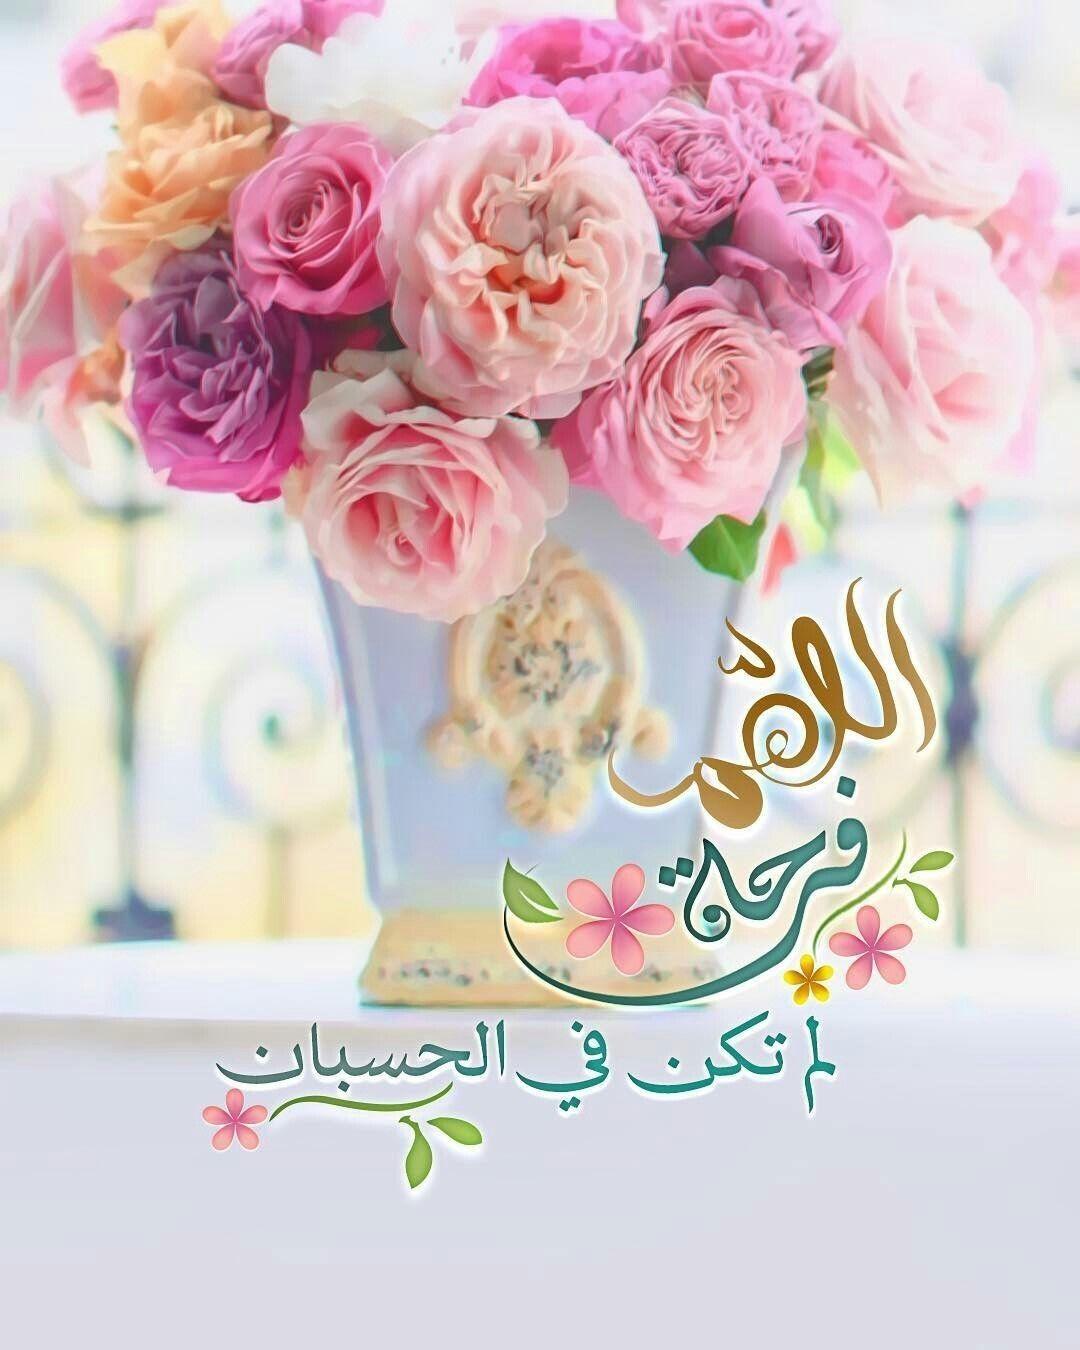 Pin By Semsem Batat On حديث نبوى Islam Facts Learn Islam Hadith